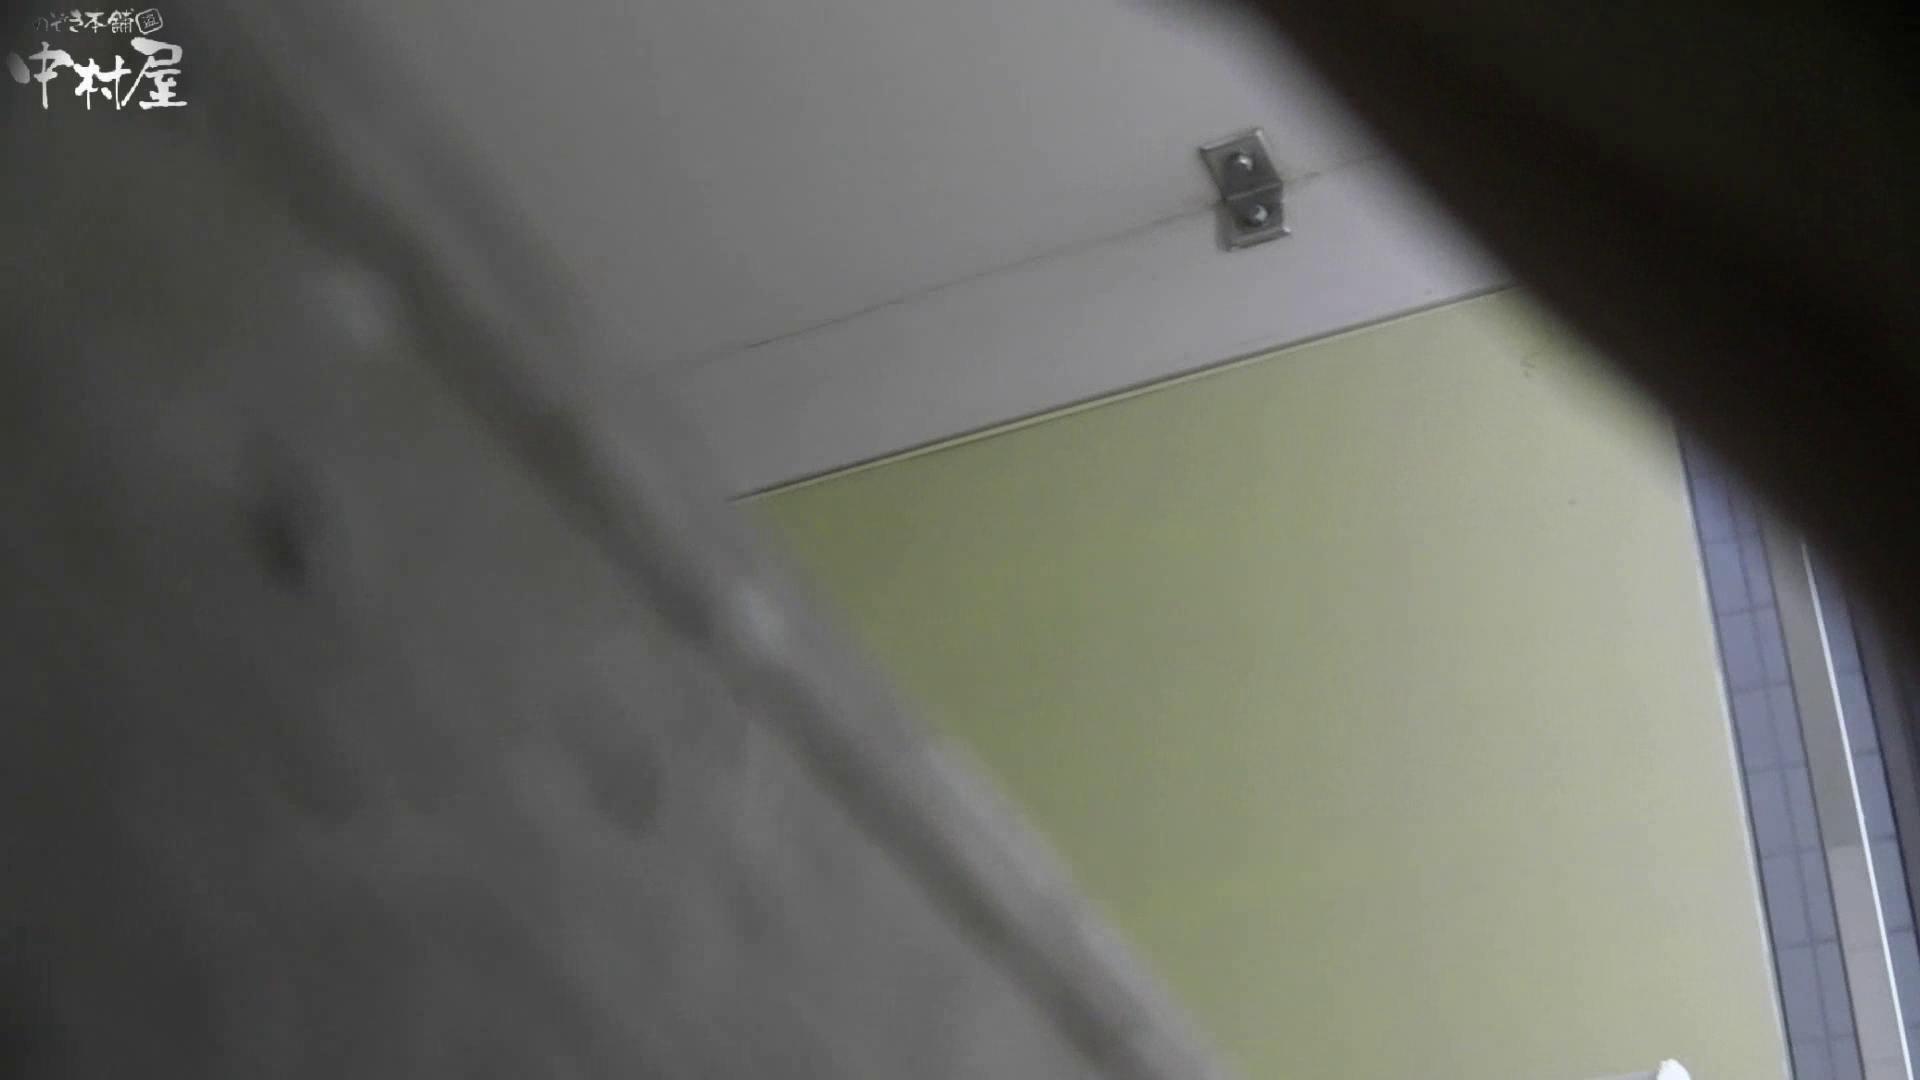 vol.06 命がけ潜伏洗面所! 茶髪タン、ハァハァ 後編 潜入突撃  82pic 12